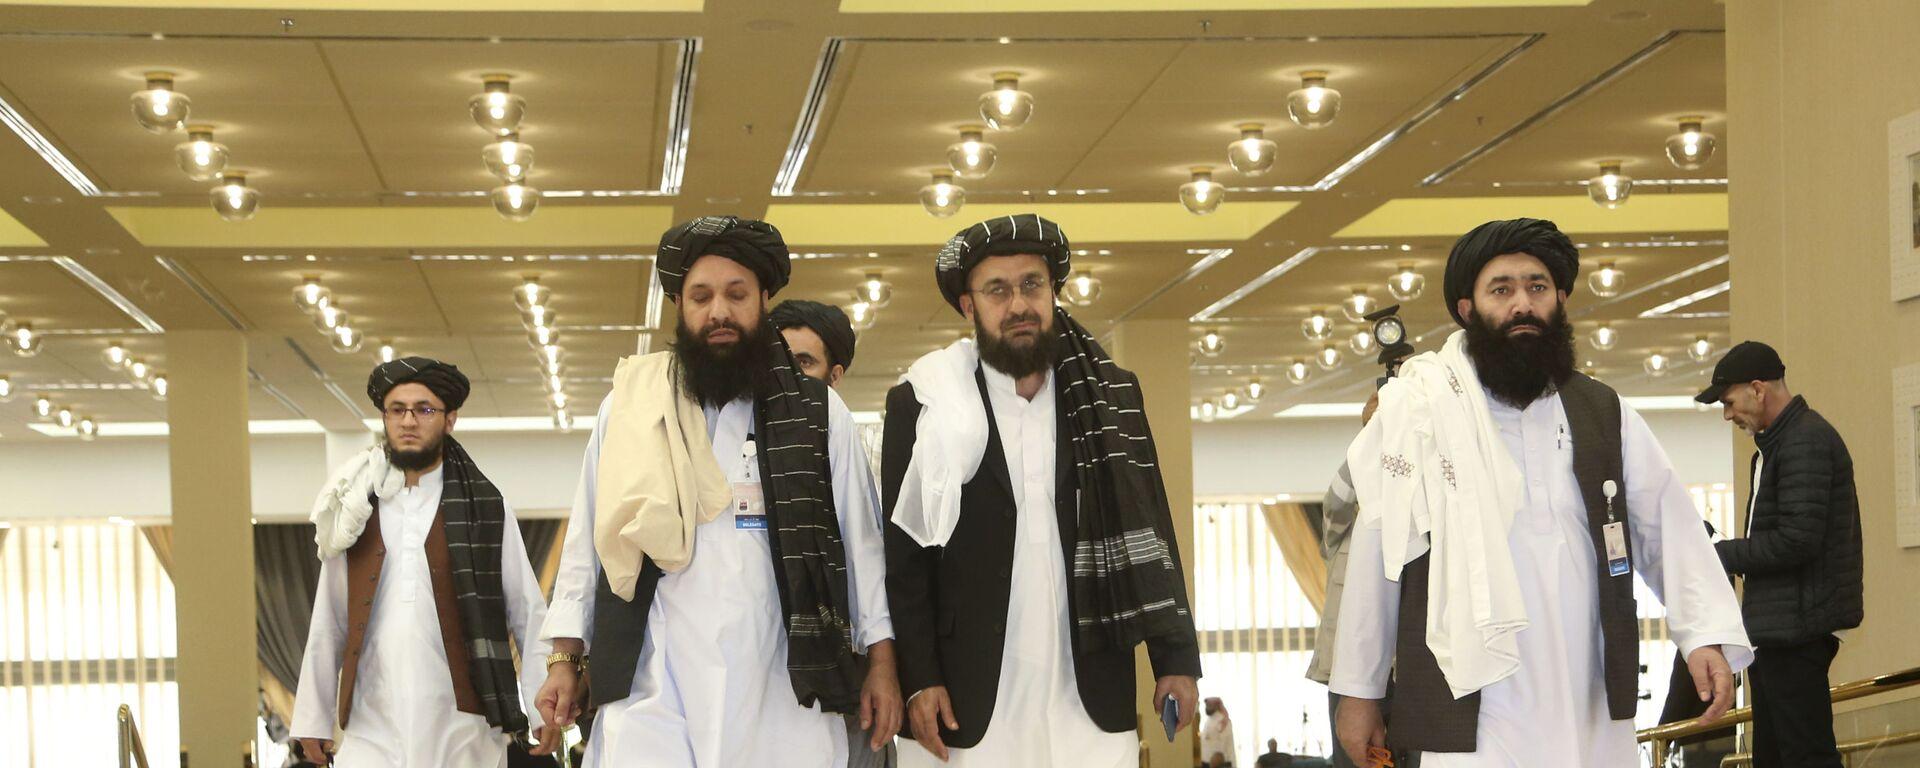 Afghanistan's Taliban delegation arrive for the agreement signing between Taliban and U.S. officials in Doha, Qatar, Saturday, Feb. 29, 2020. - Sputnik International, 1920, 14.08.2021